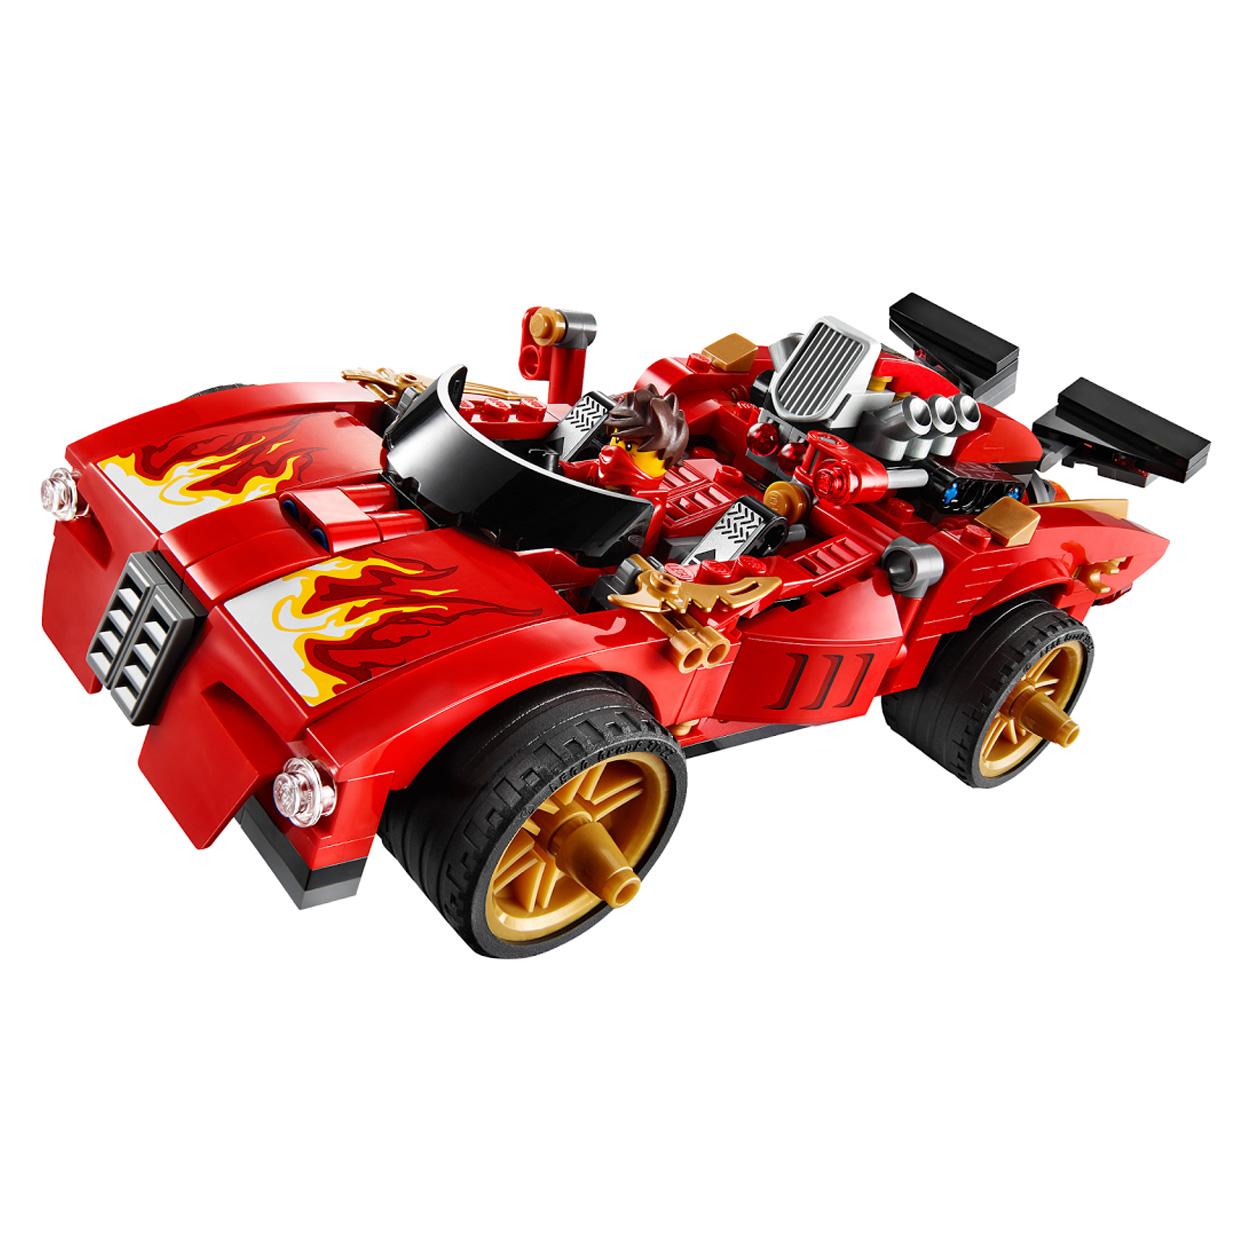 Coloriage voiture ninjago imprimer - Lego ninjago voiture ...